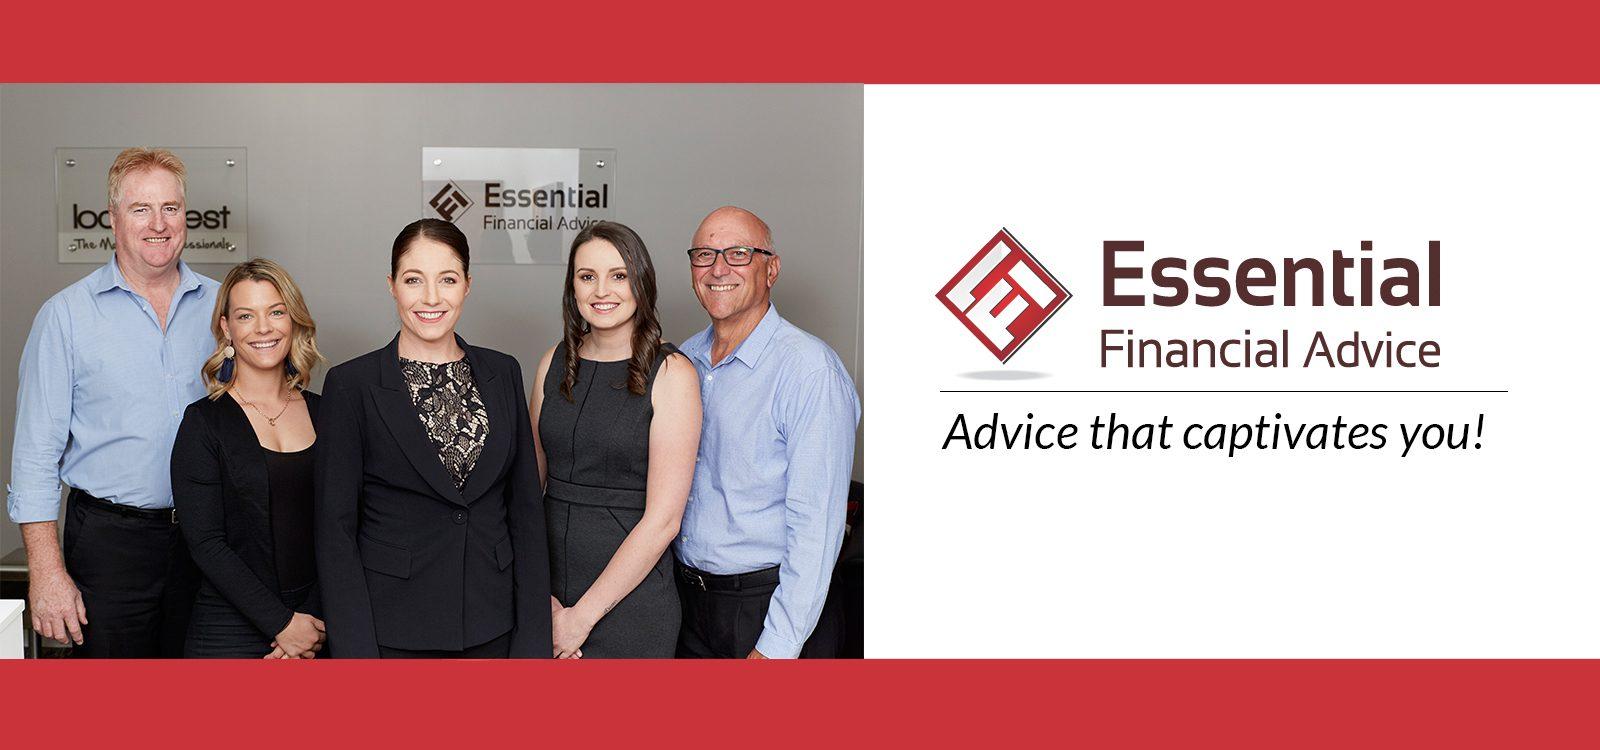 Essential Financial Advice